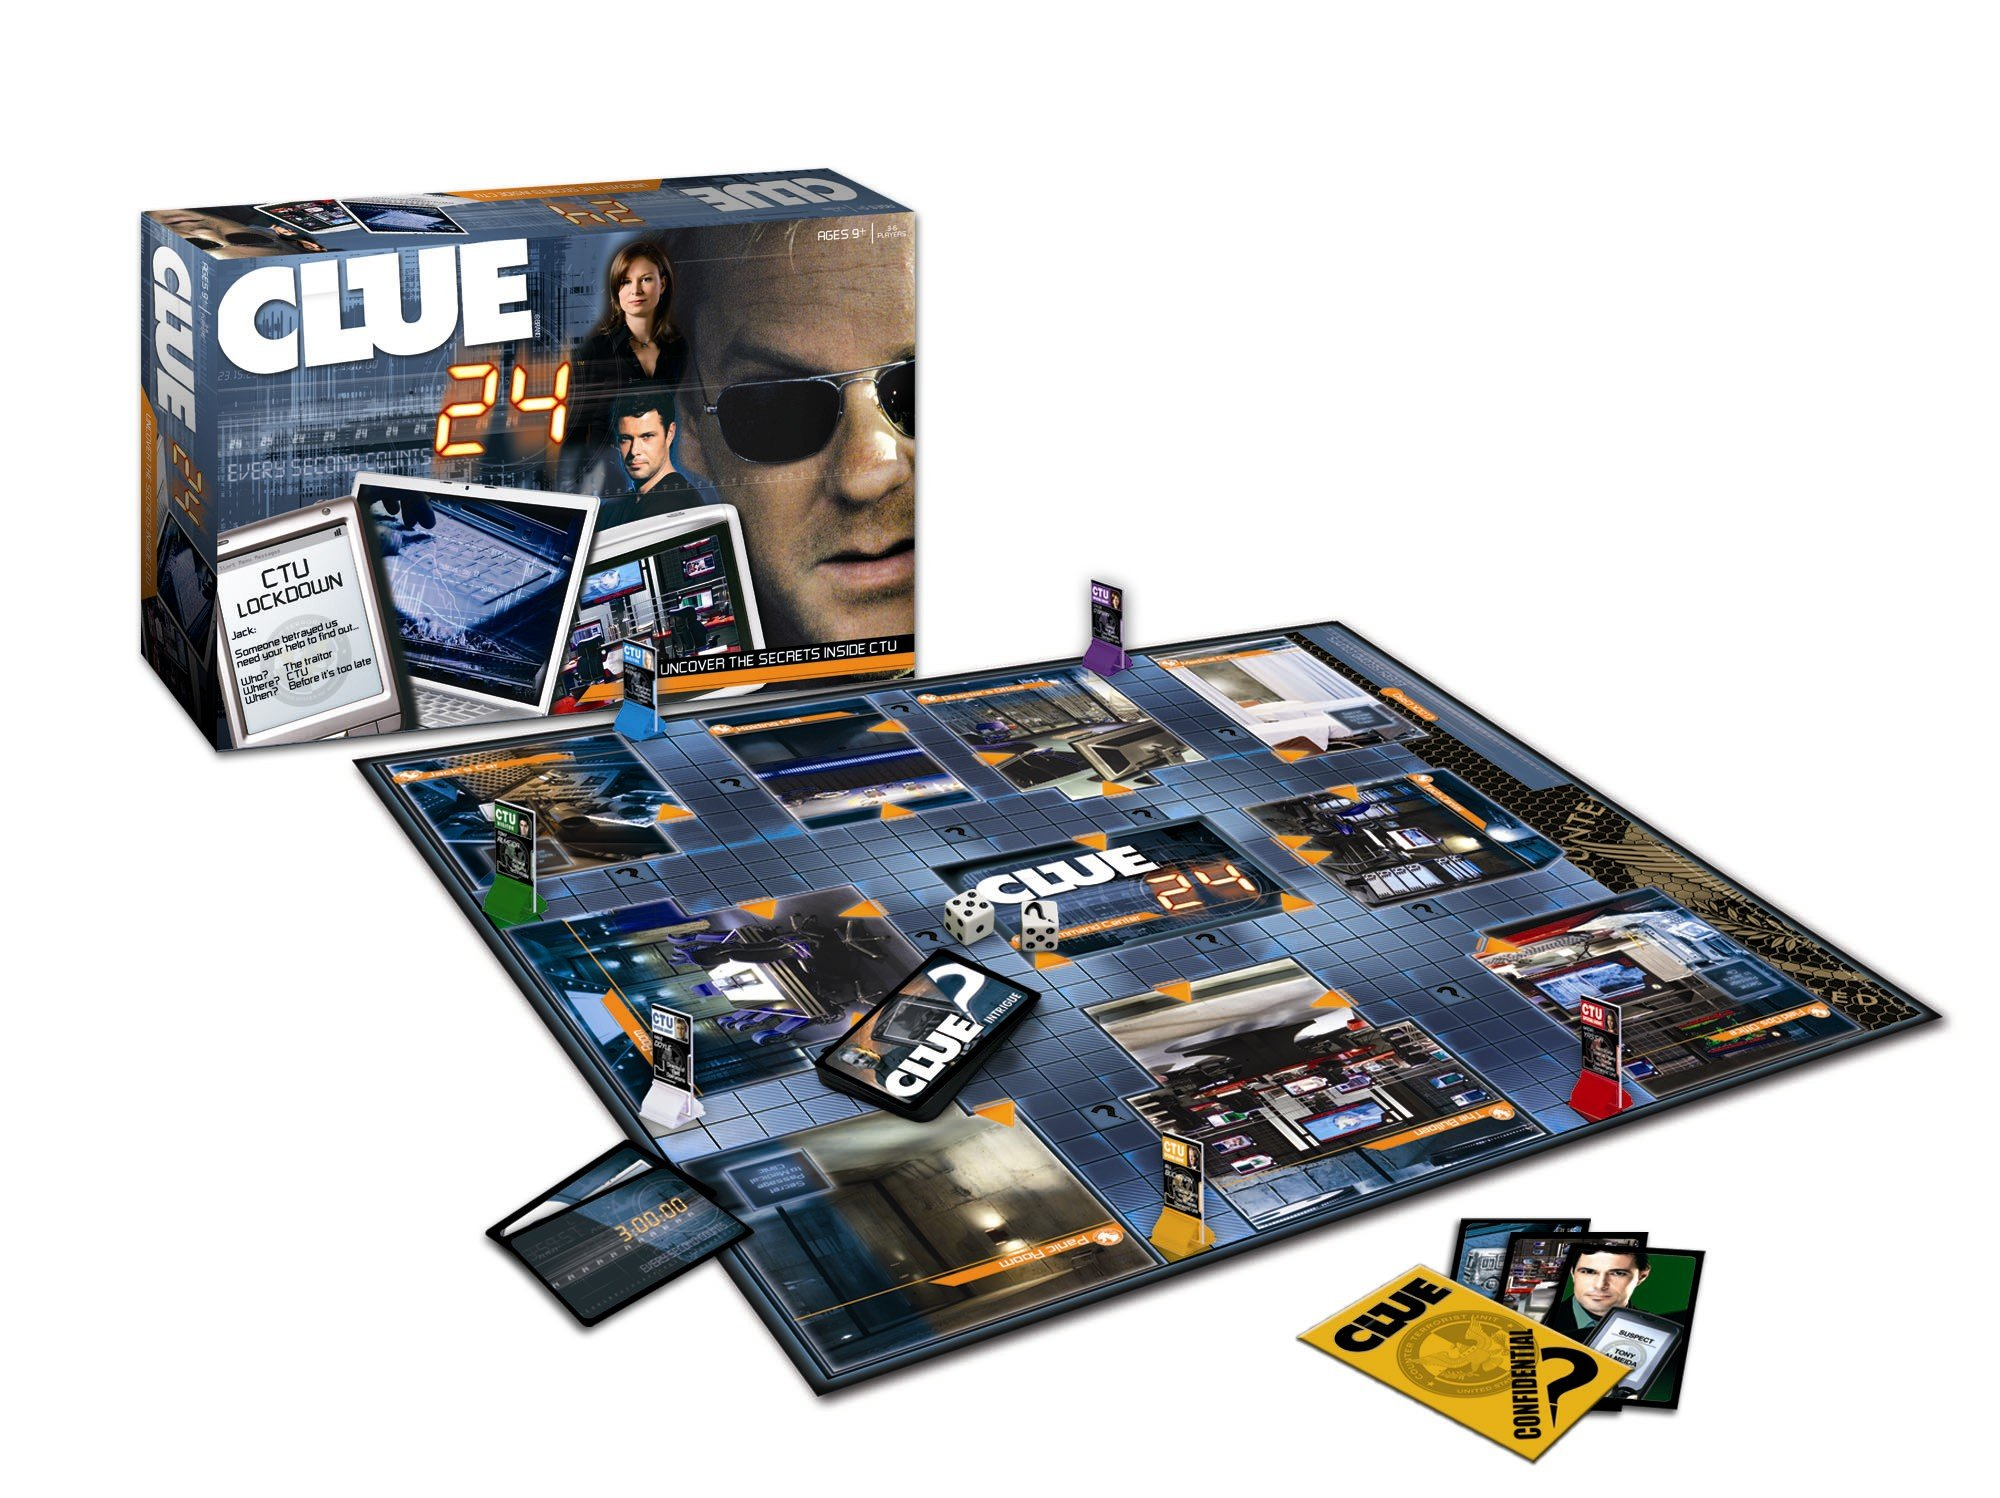 Clue 24 TV Games